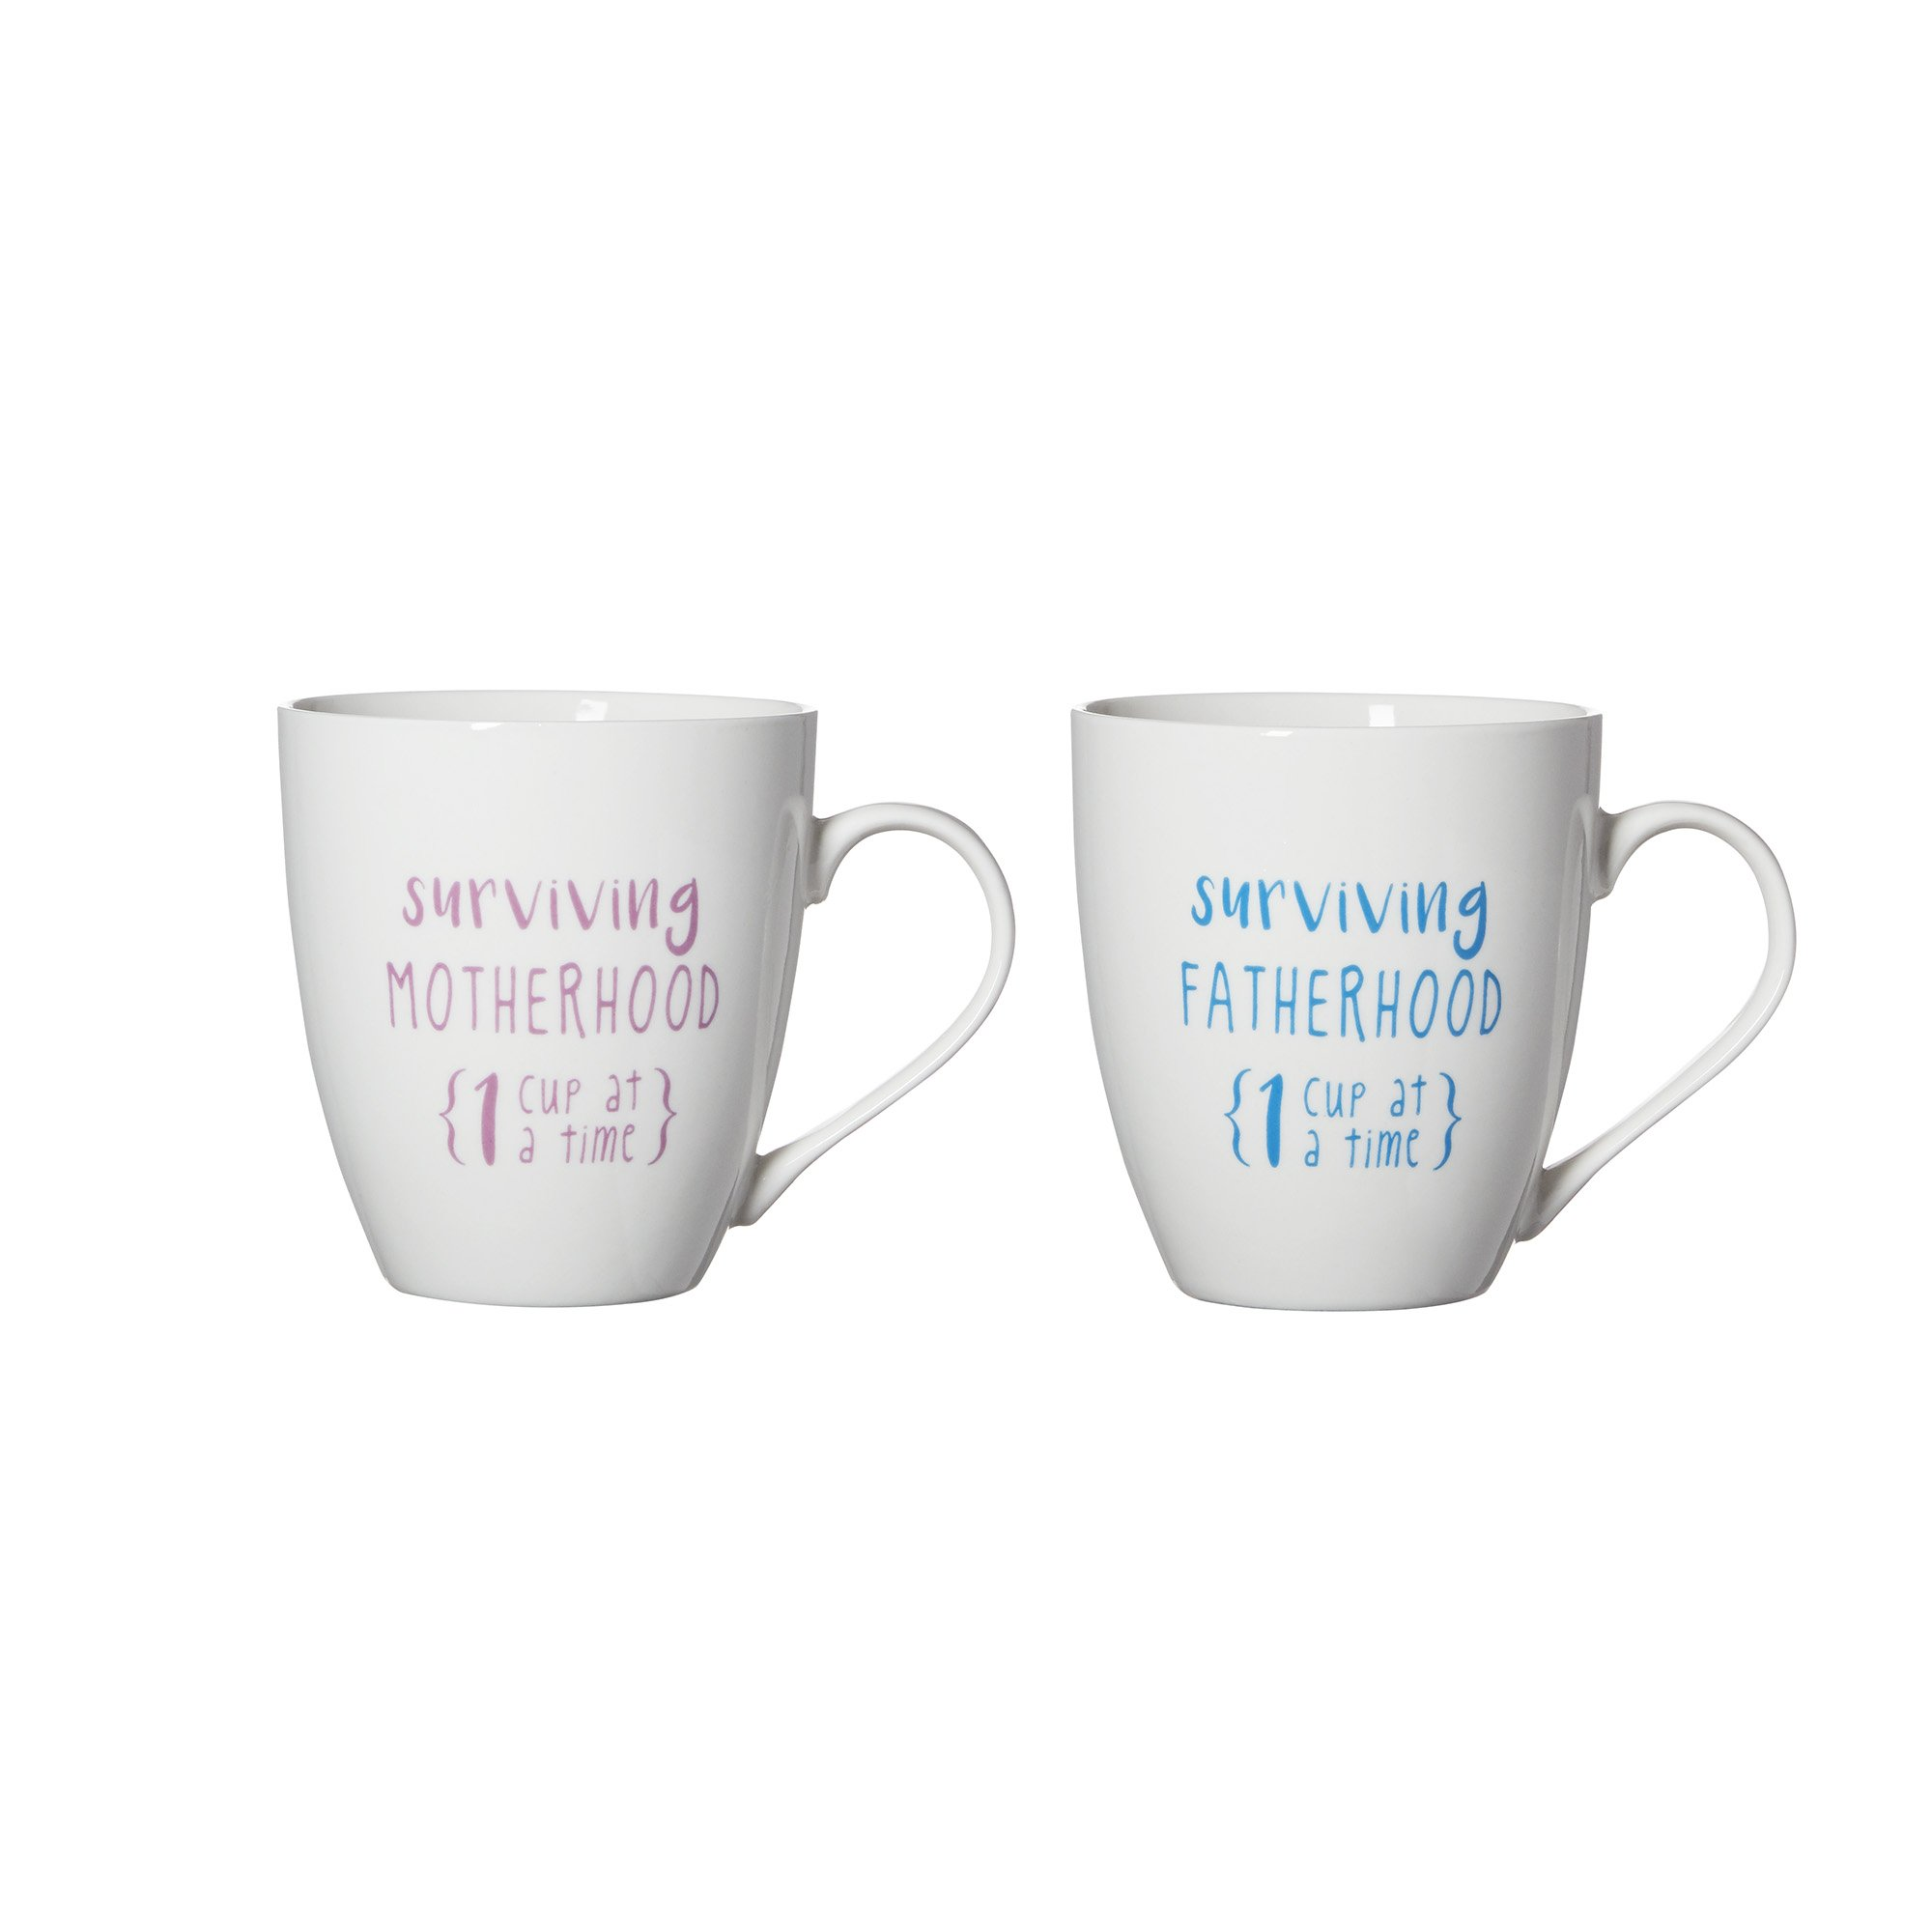 Pfaltzgraff''Surviving Motherhood/Fatherhood'' Everyday Mug (Set of 2), 18 oz, Assorted